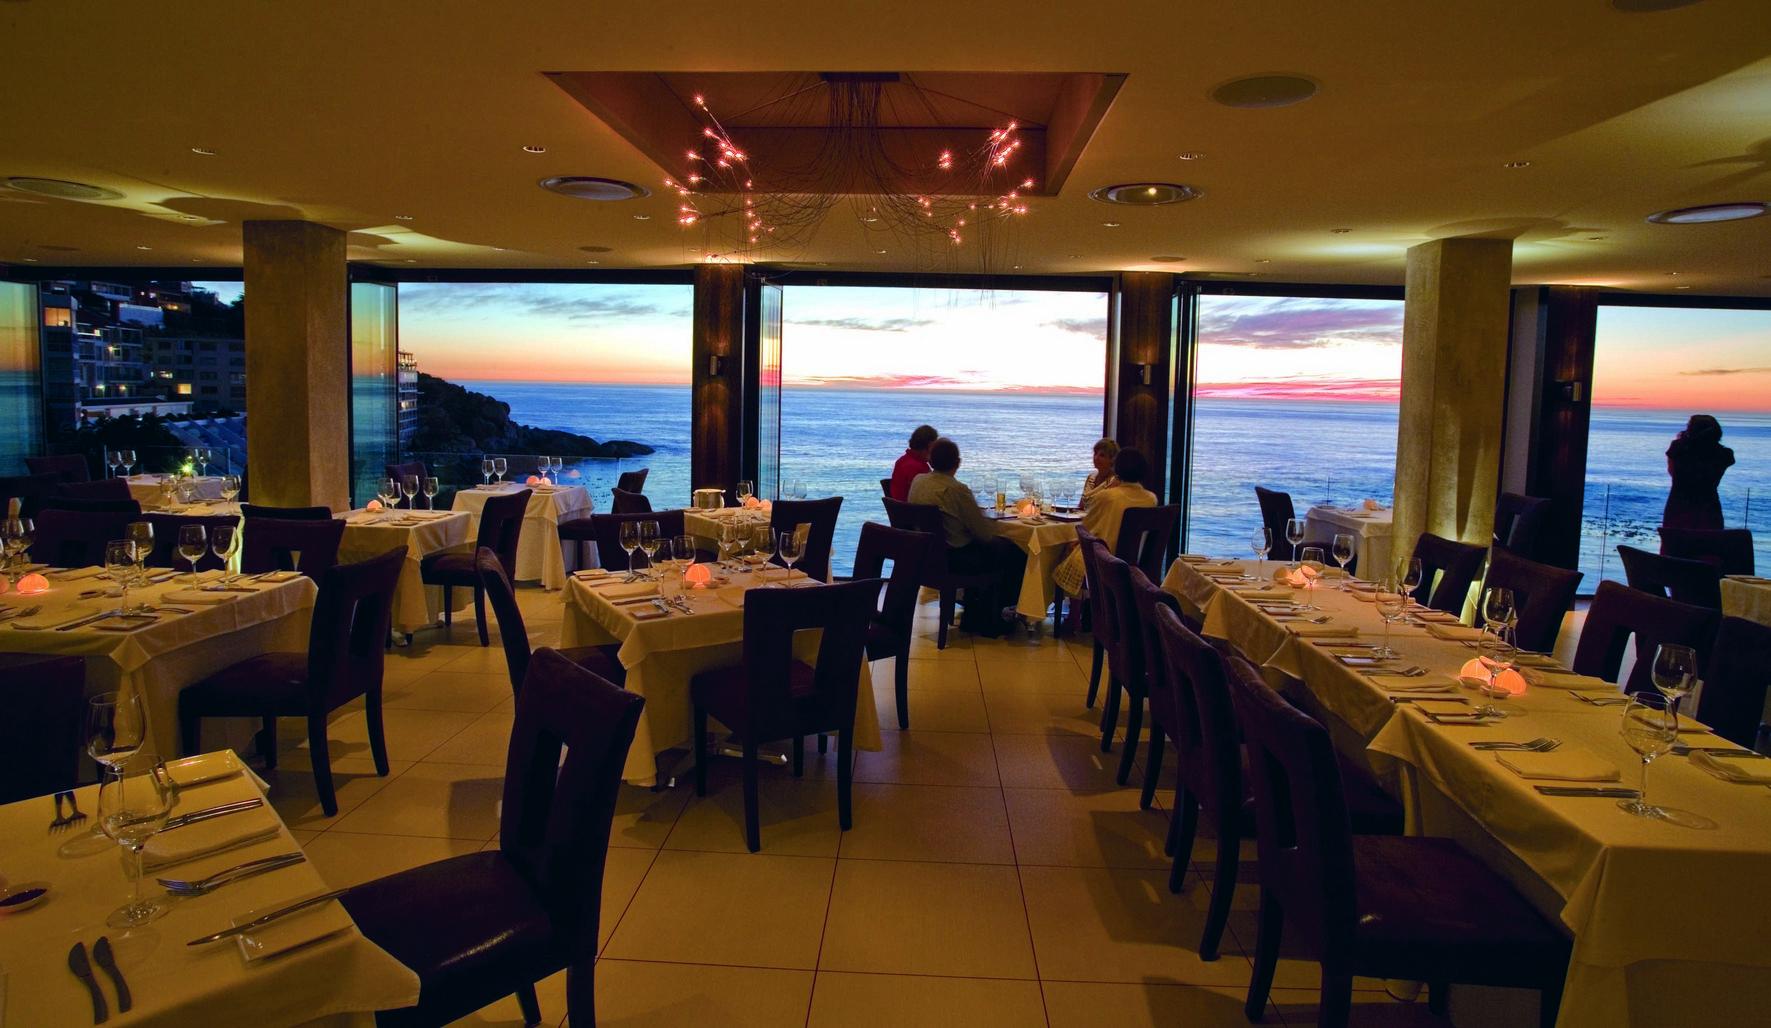 Salt Restaurant Ambassador Hotel Cape Town